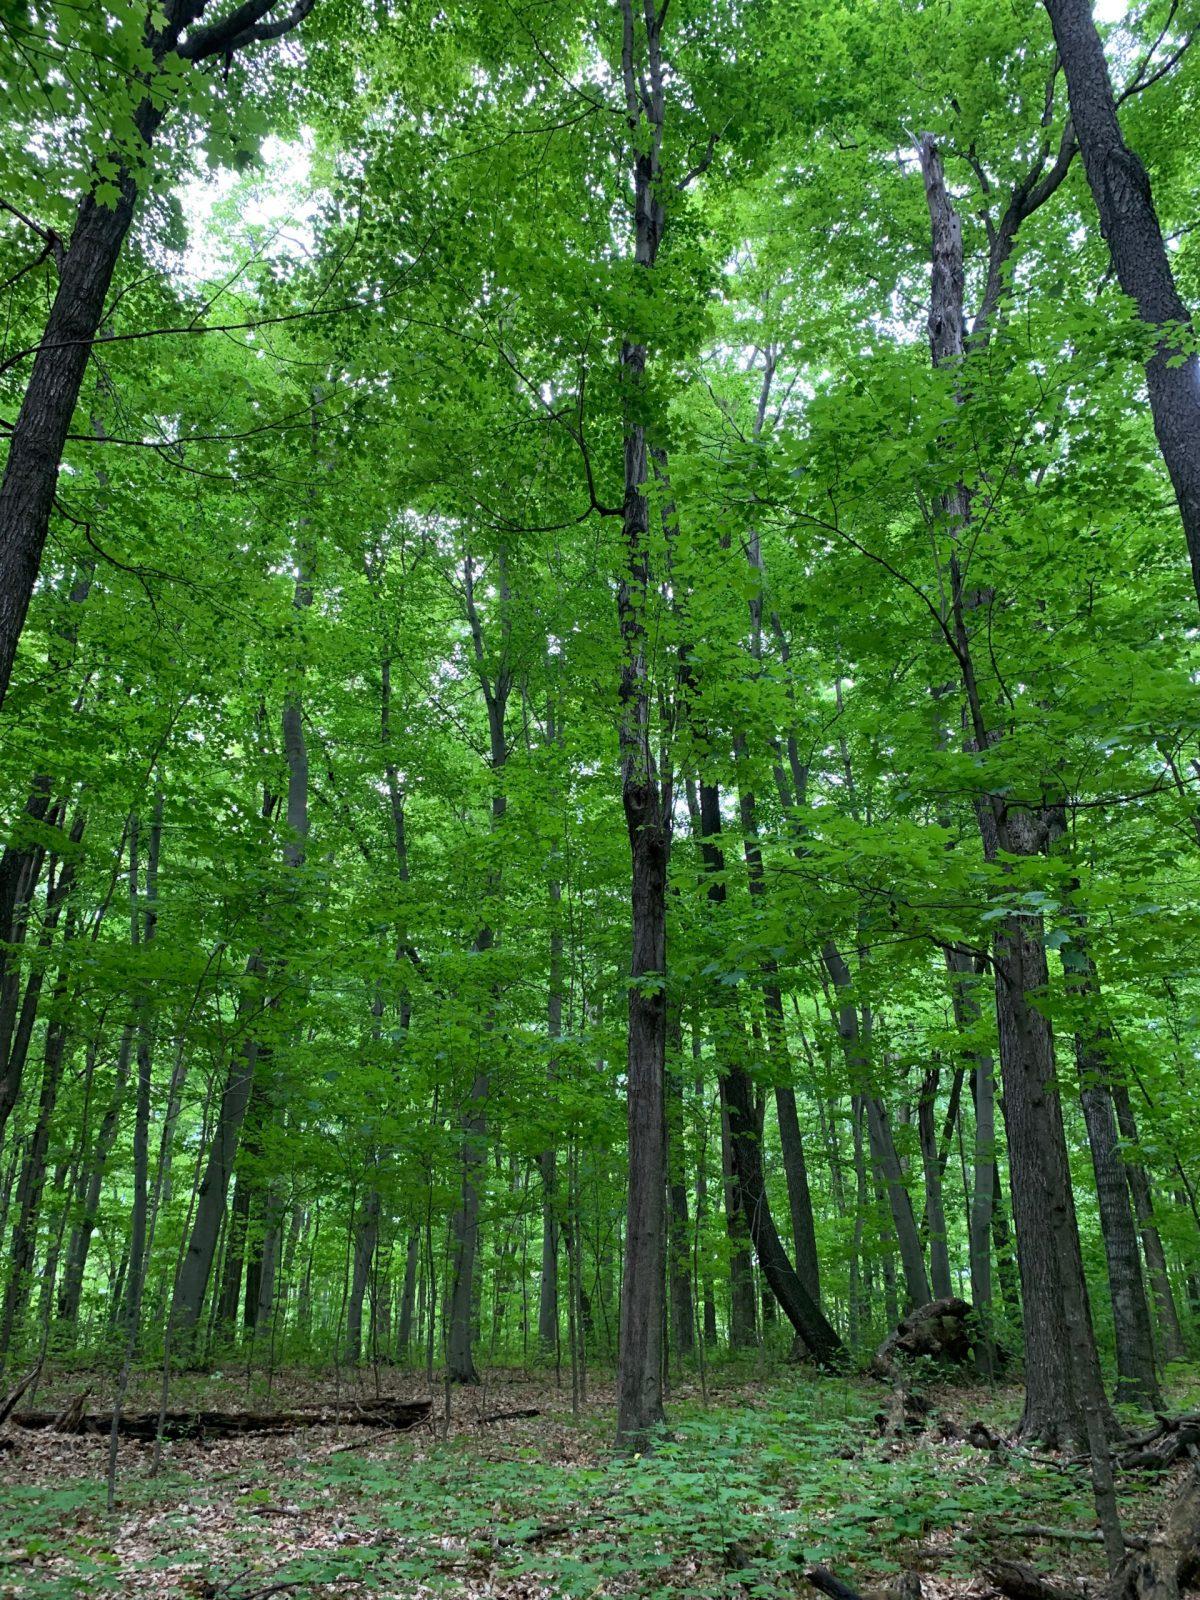 dense trees in park